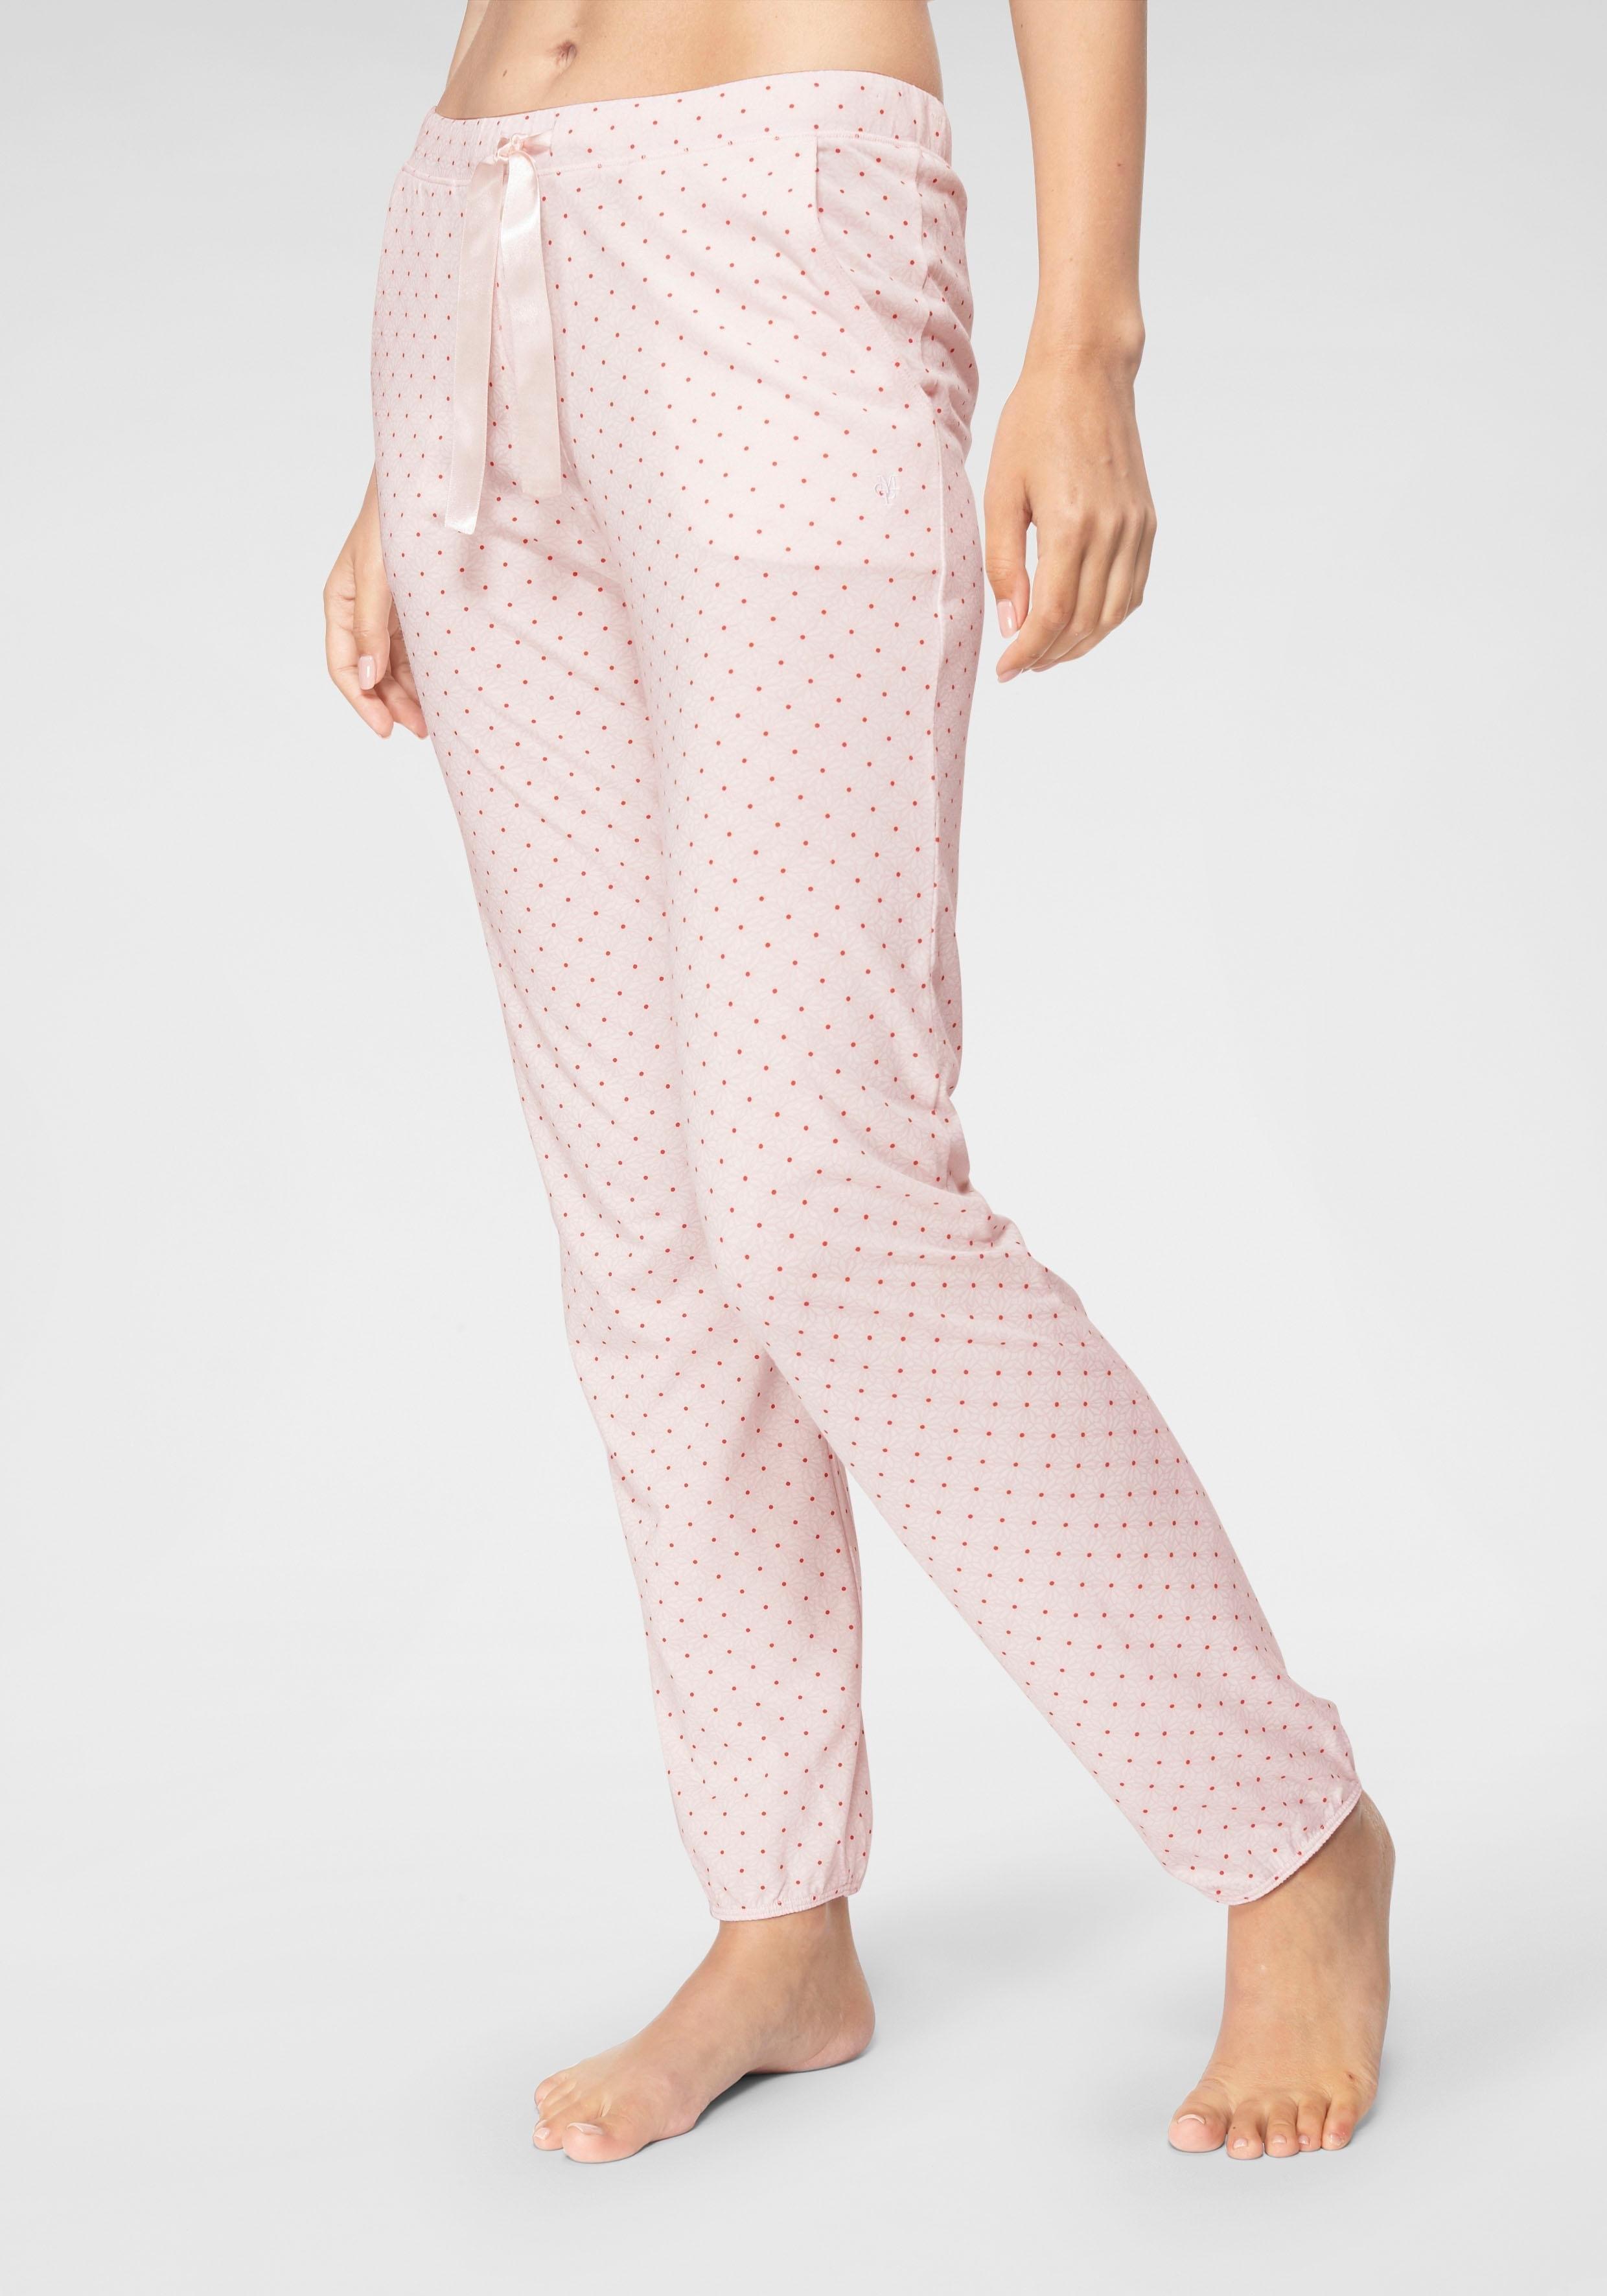 Marc O'Polo pyjamabroek goedkoop op lascana.nl kopen